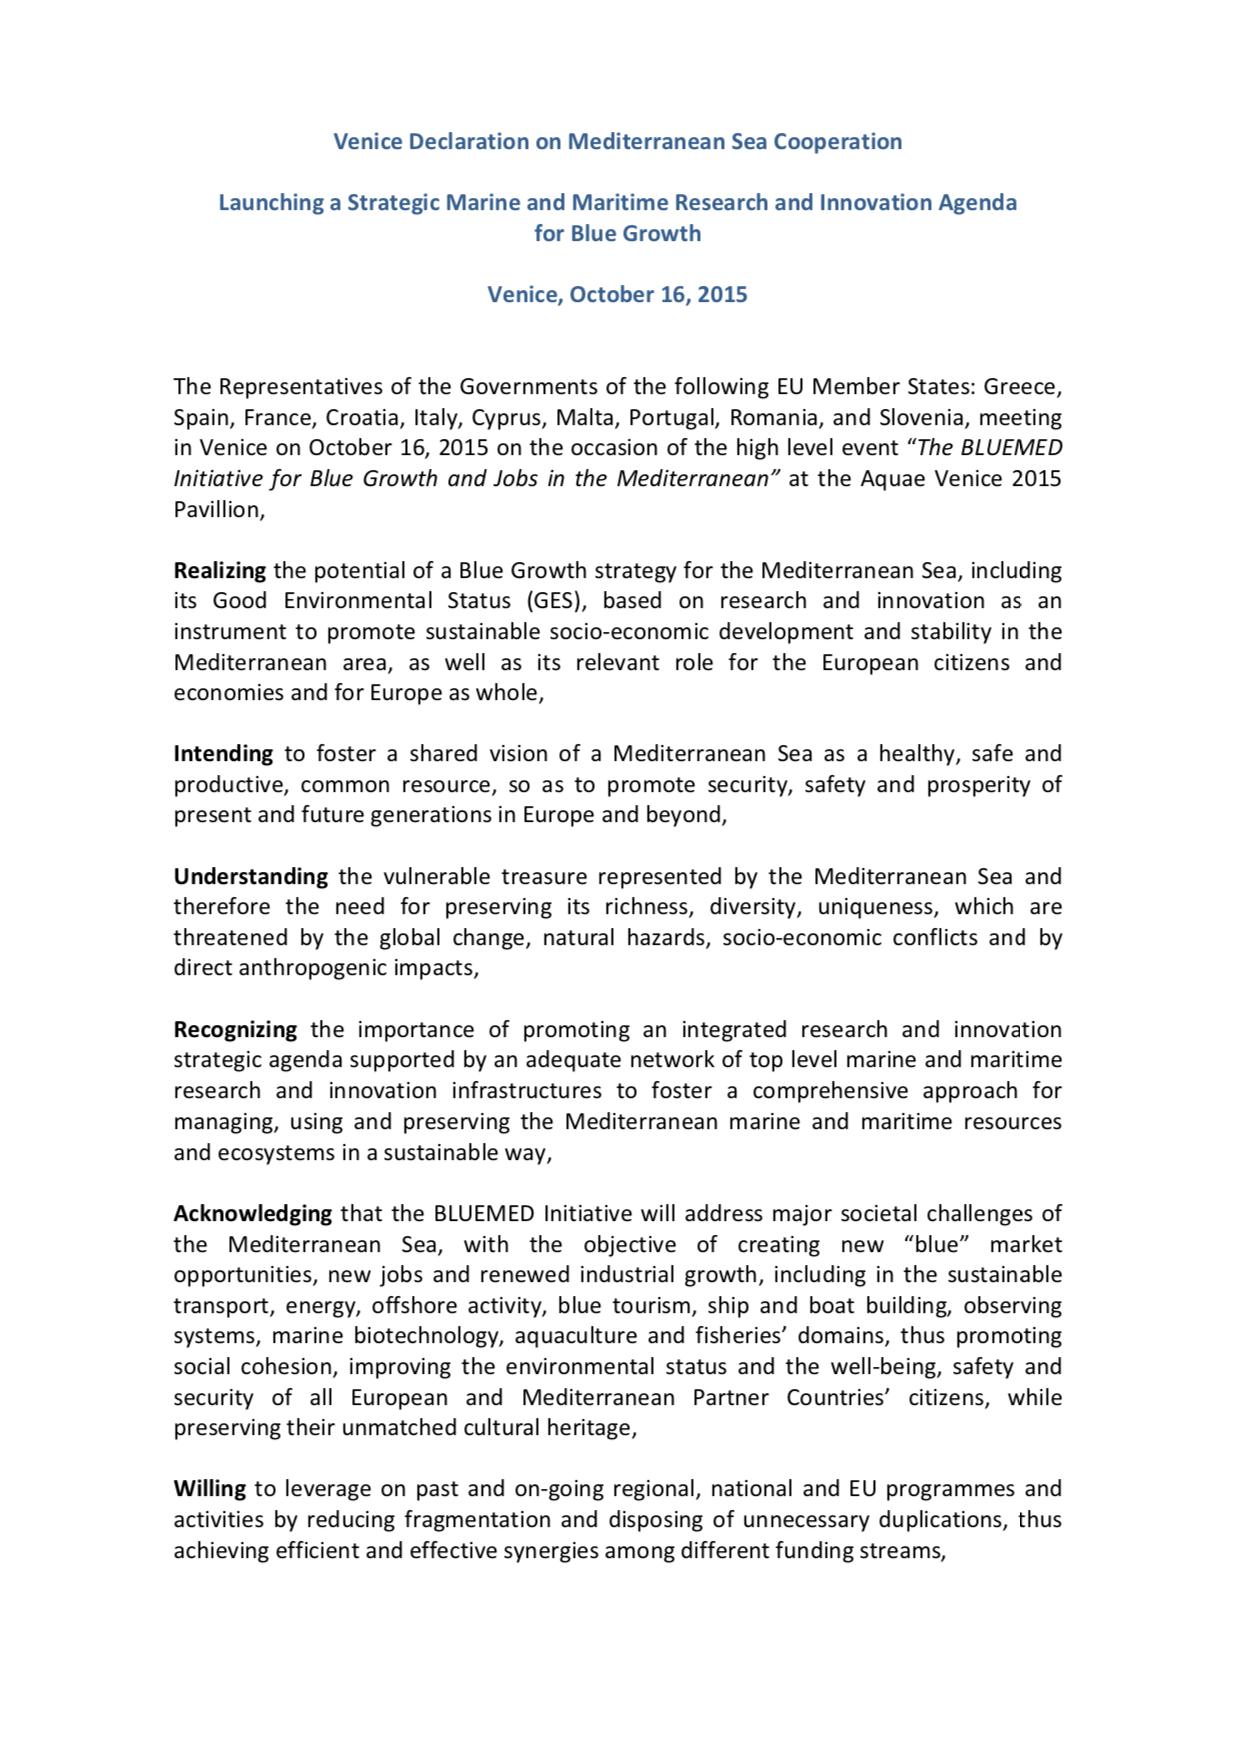 Venice Declaration October 2015